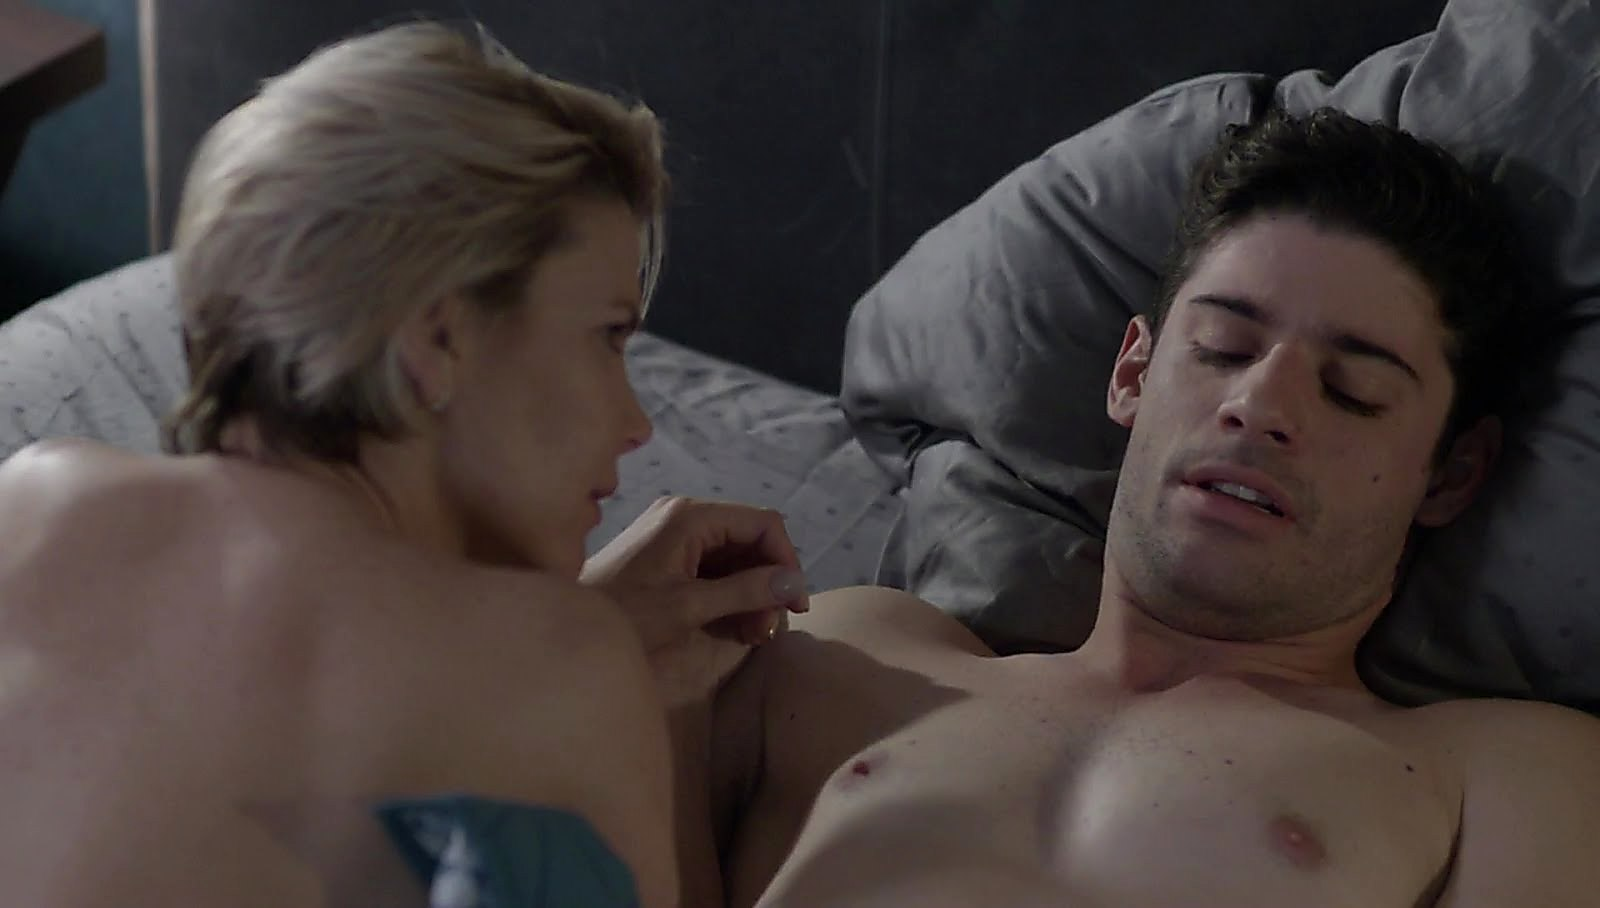 Jonathan Freudman latest sexy shirtless scene June 12, 2018, 1am